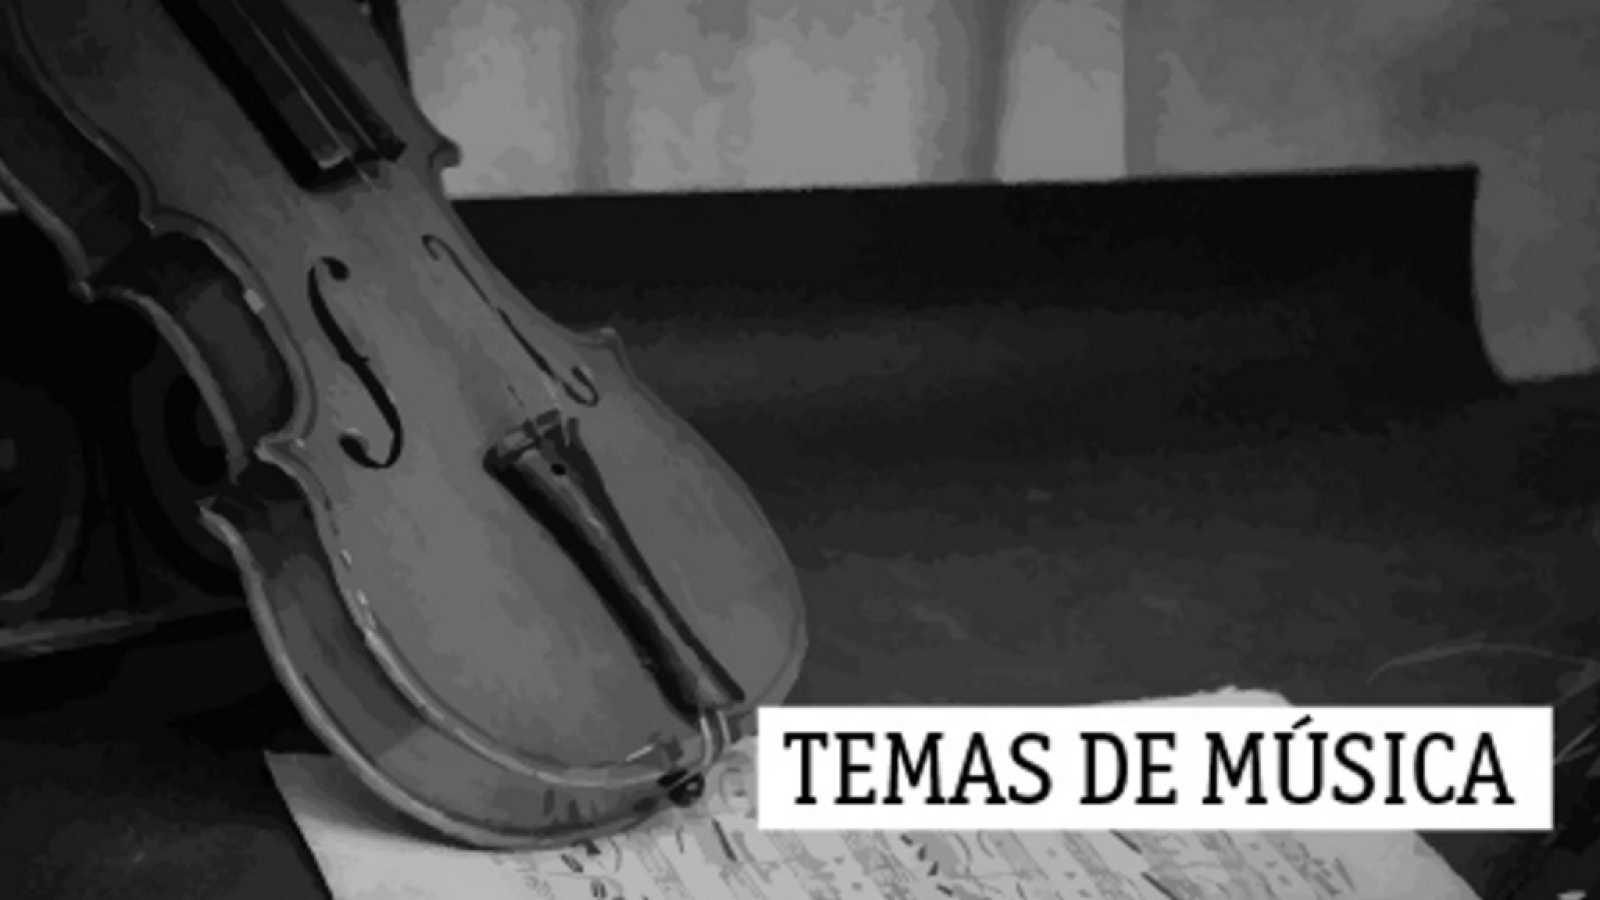 Temas de música - Diálogo a 4: Cuartetos de cuerda de Beethoven (VI) - 19/07/20 - escuchar ahora